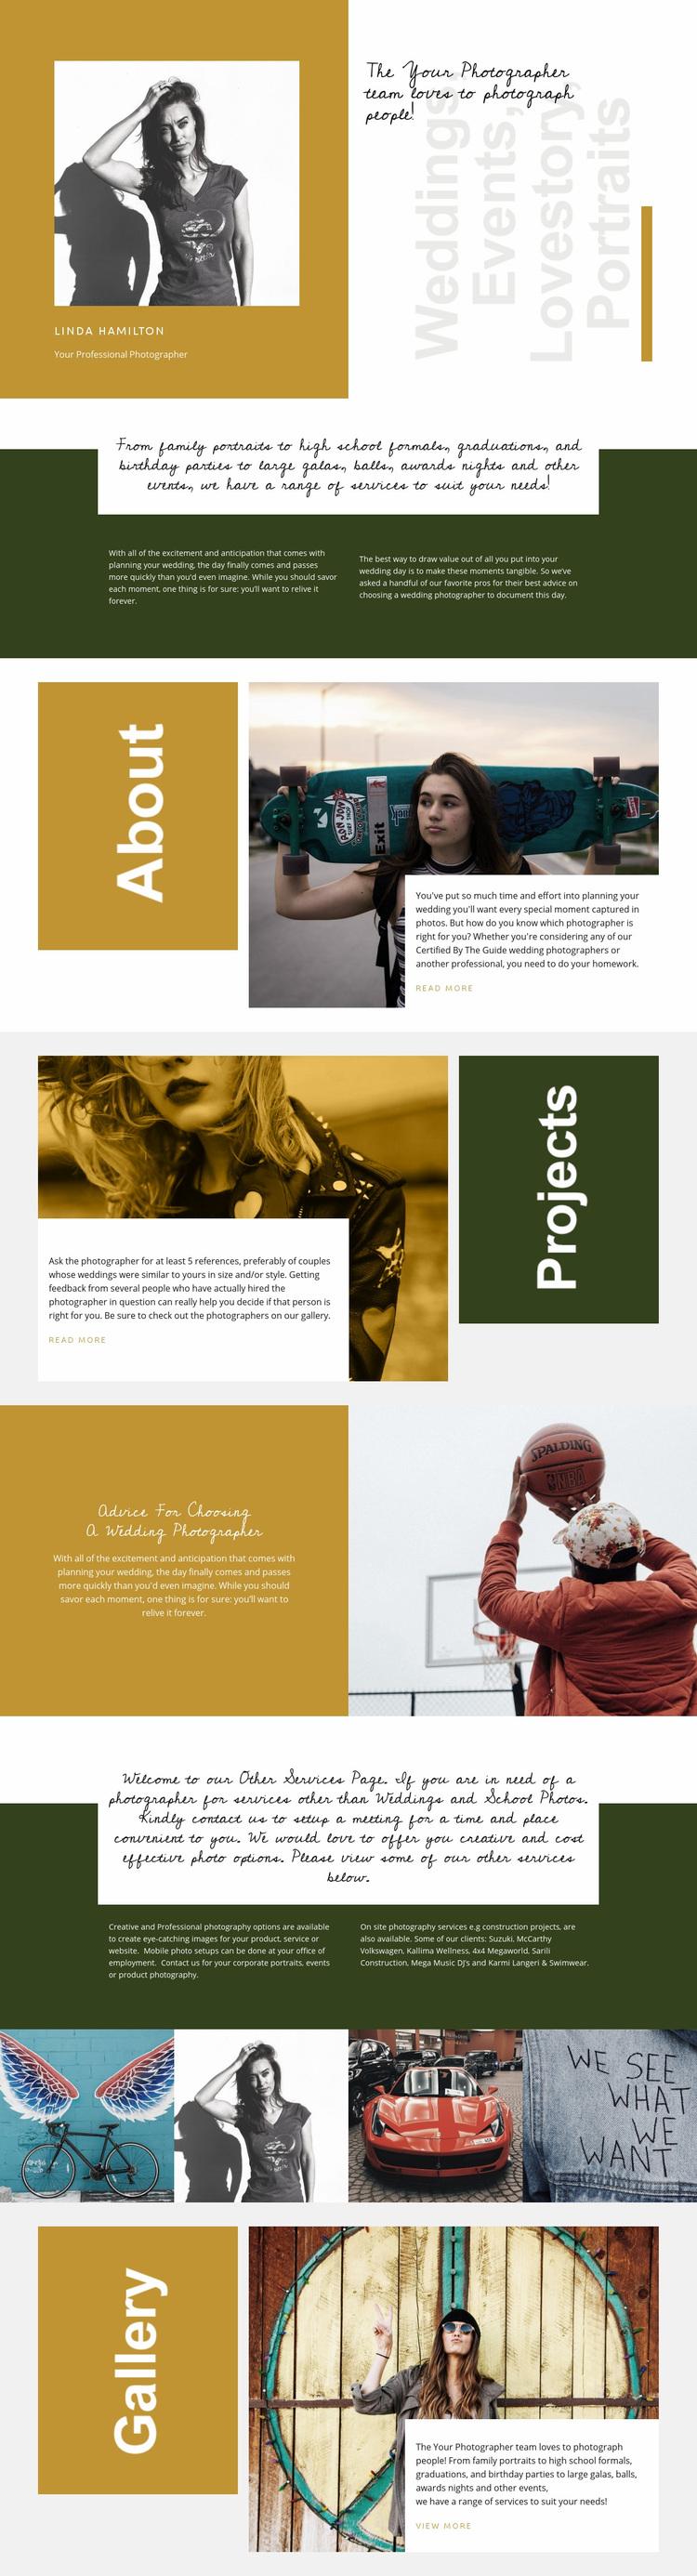 Fashion photography courses Web Page Designer